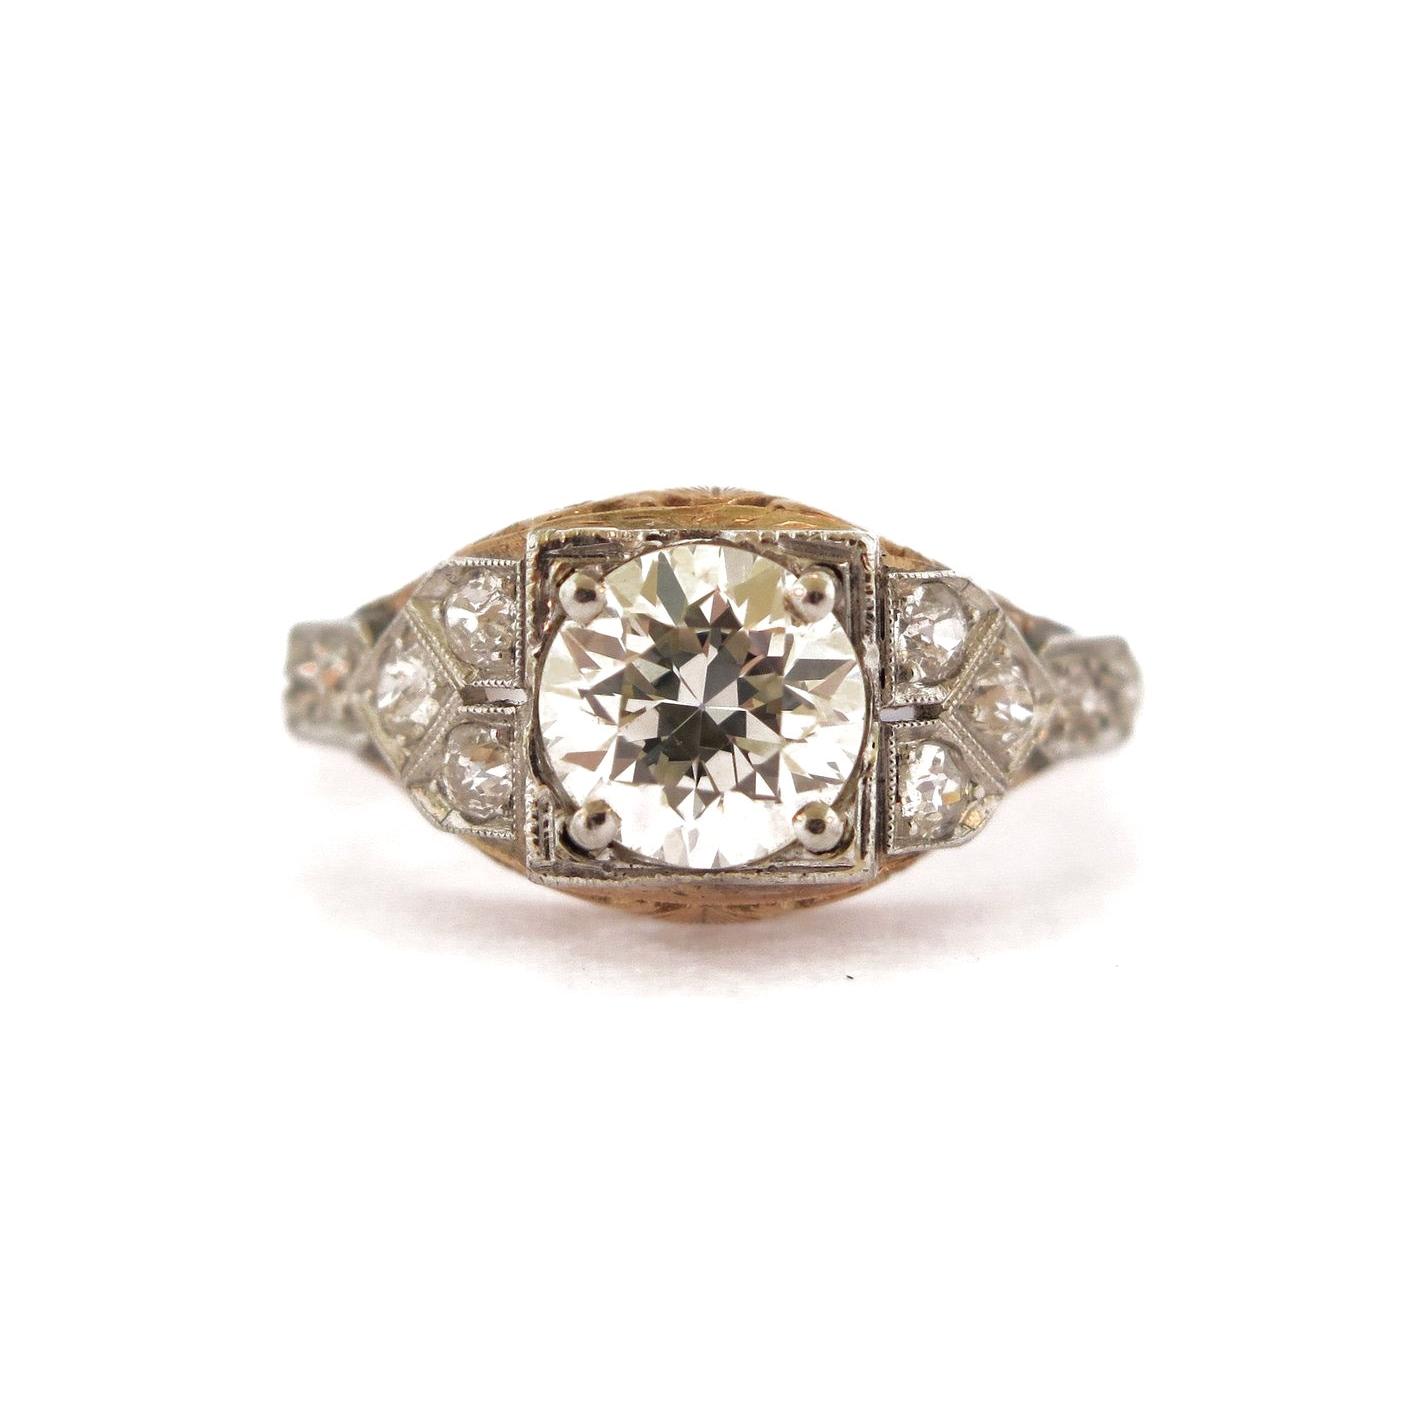 1 ct Two-Tone Diamond Ring